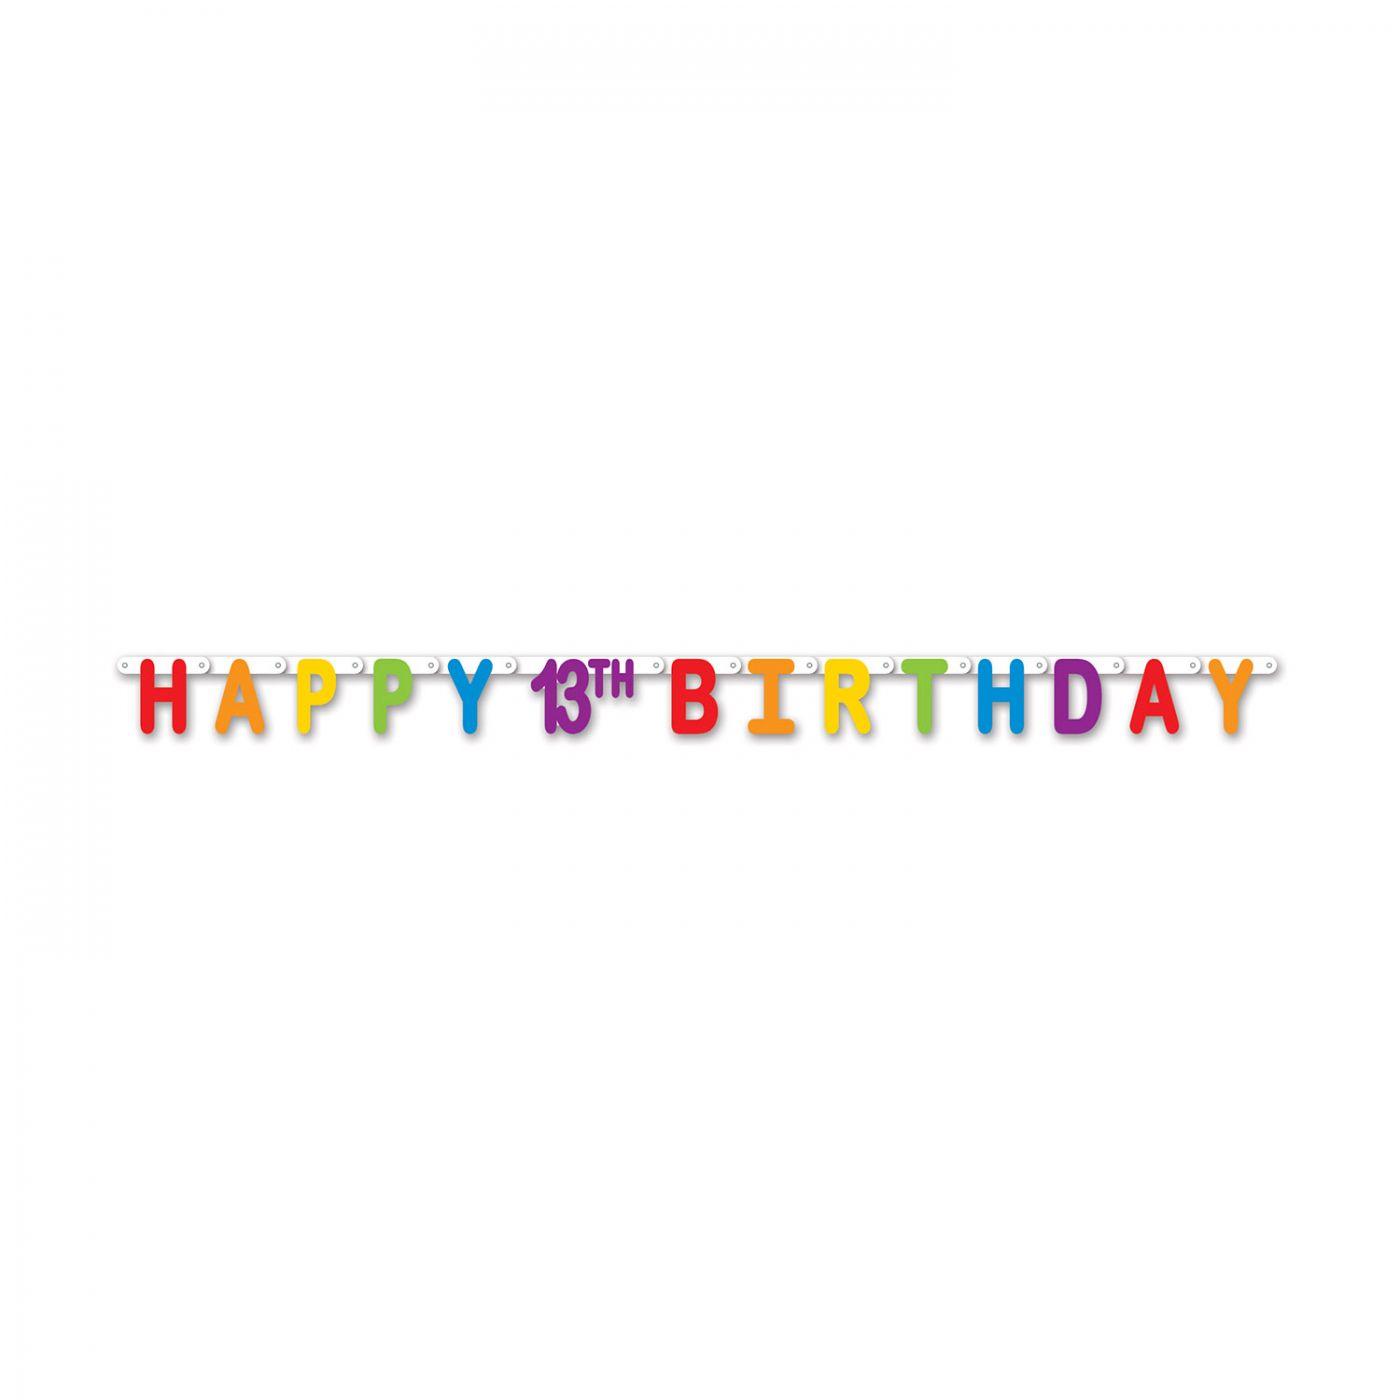 Happy 13th Birthday Streamer image